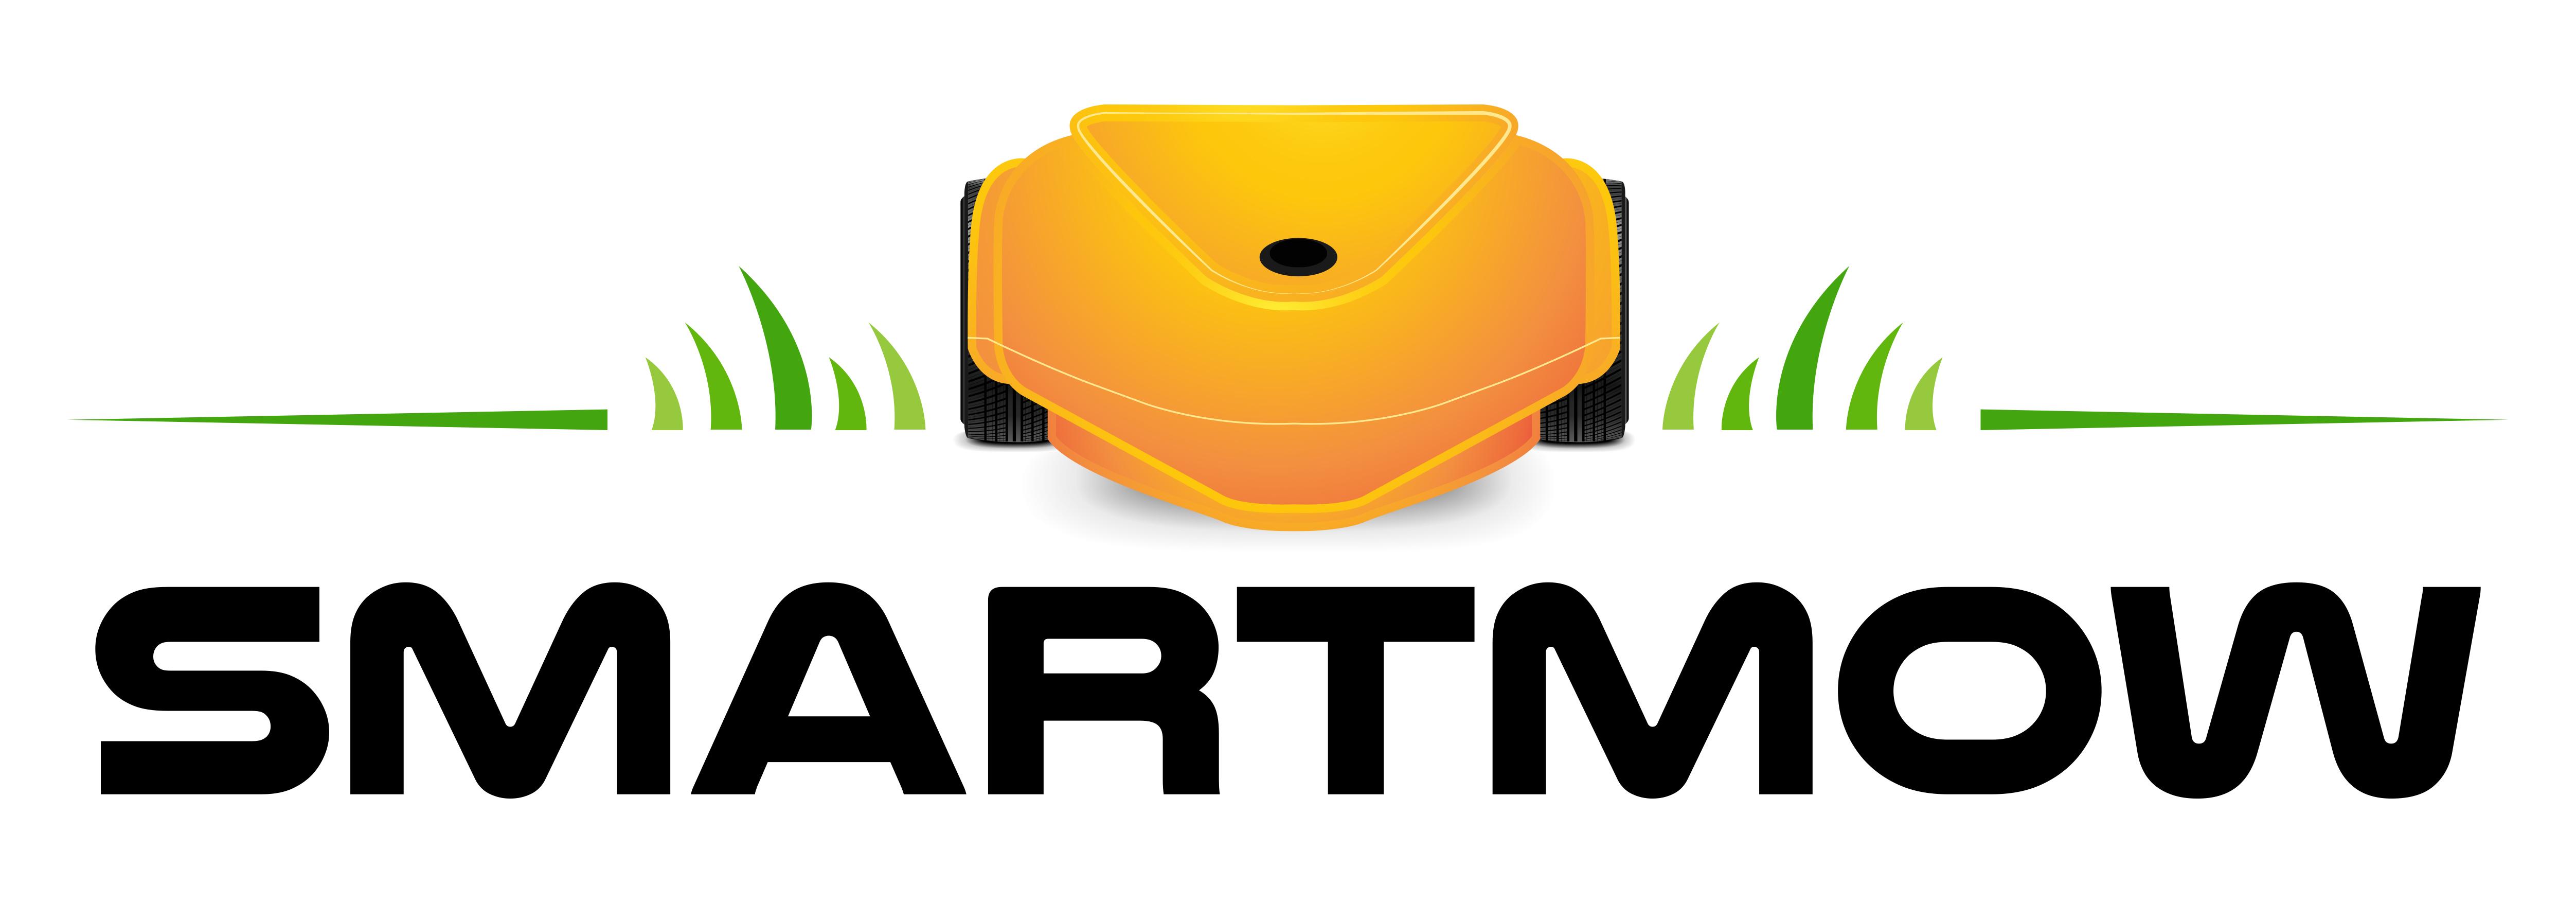 SmartMow Robot Lawn Mower